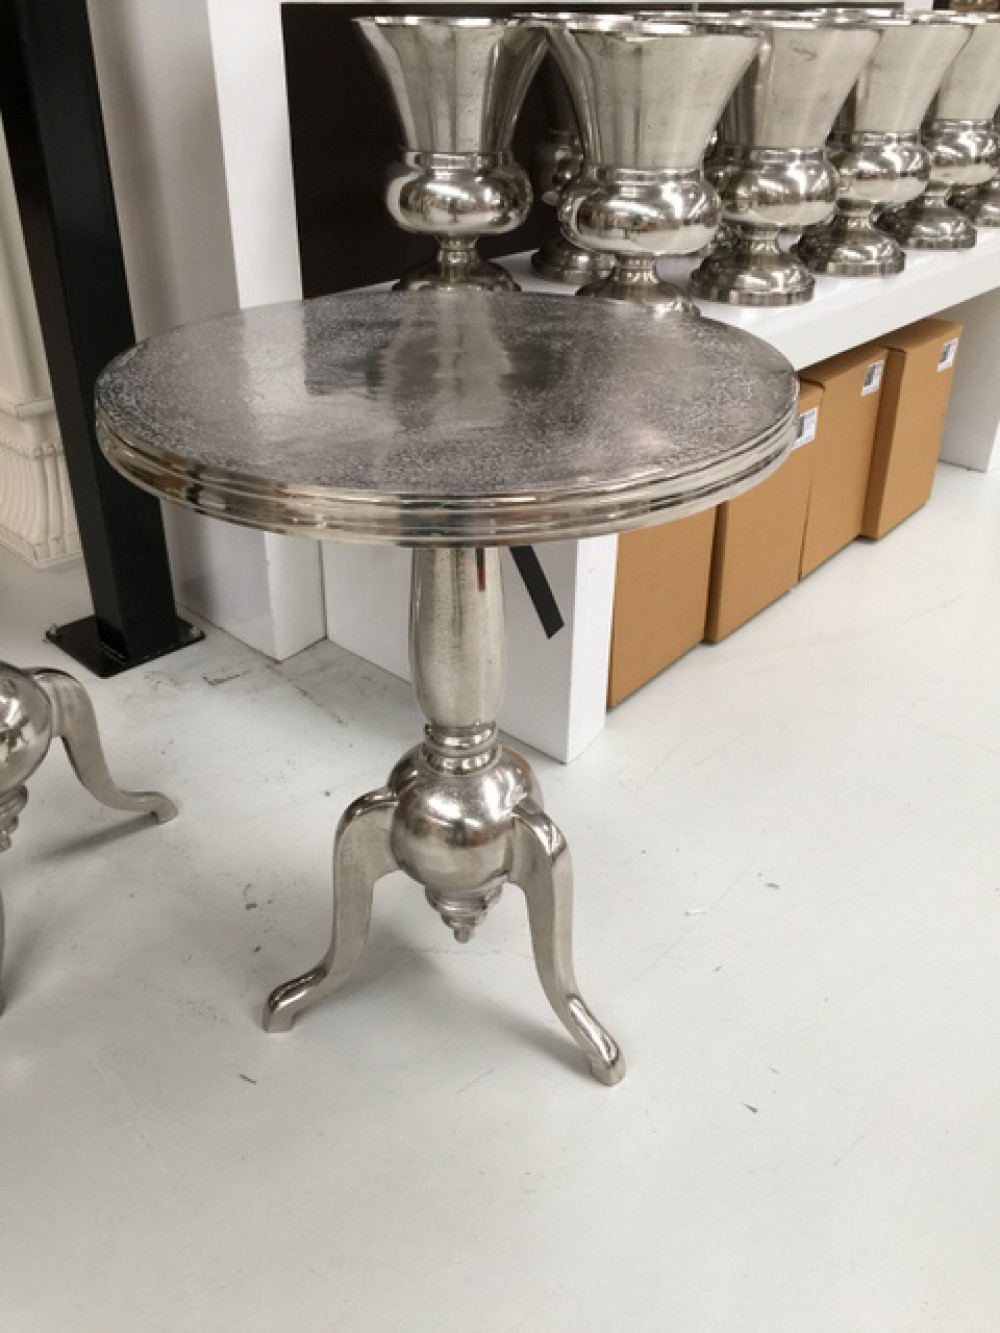 Bistrotisch metall silber metall tisch rund aus aluminium for Metall tisch